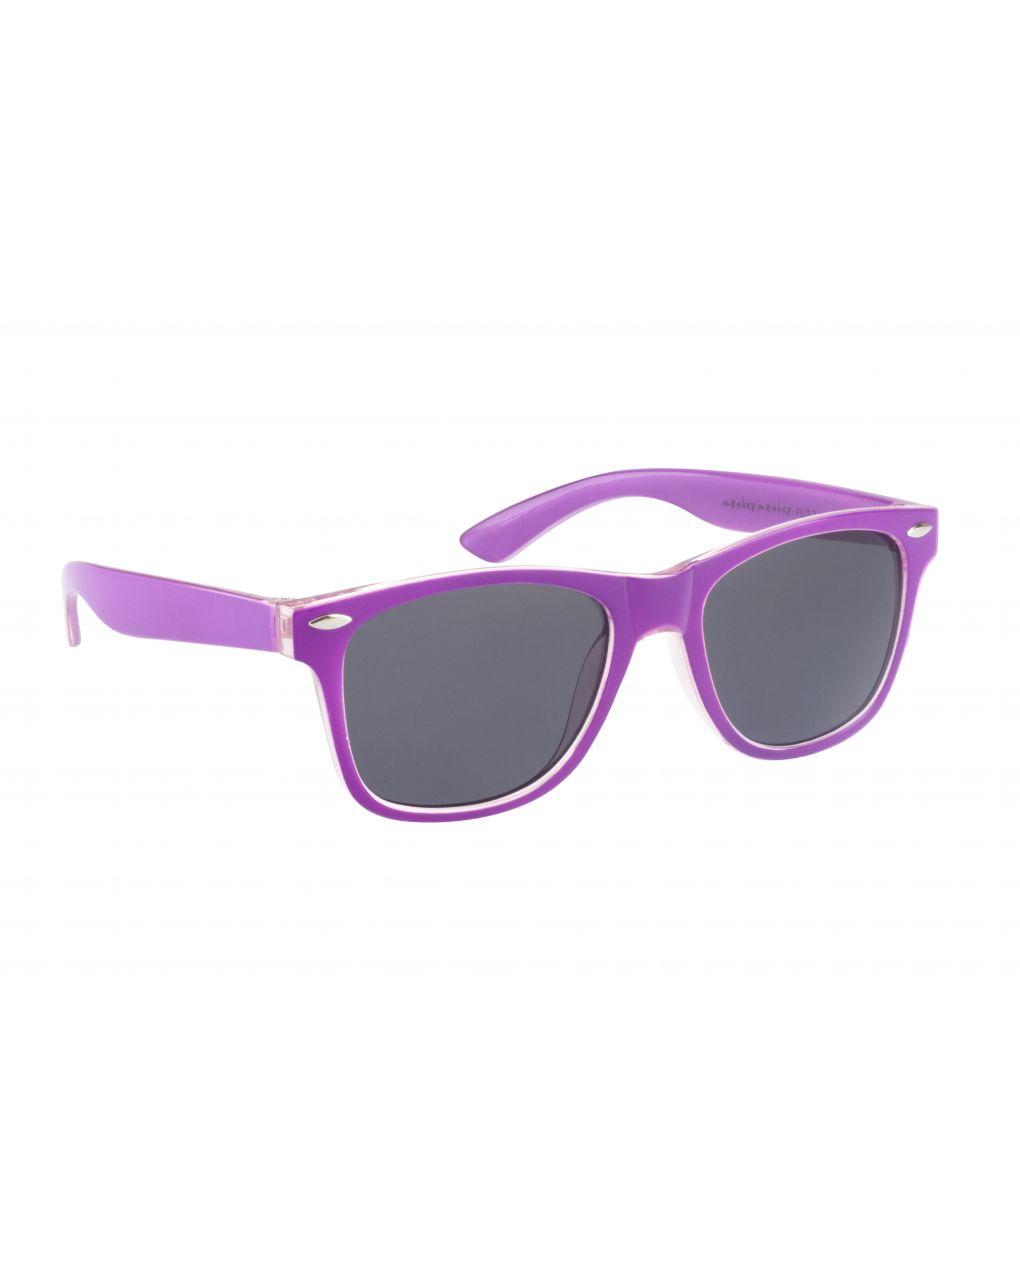 Occhiali da sole viola rosa - Monkey Monkey